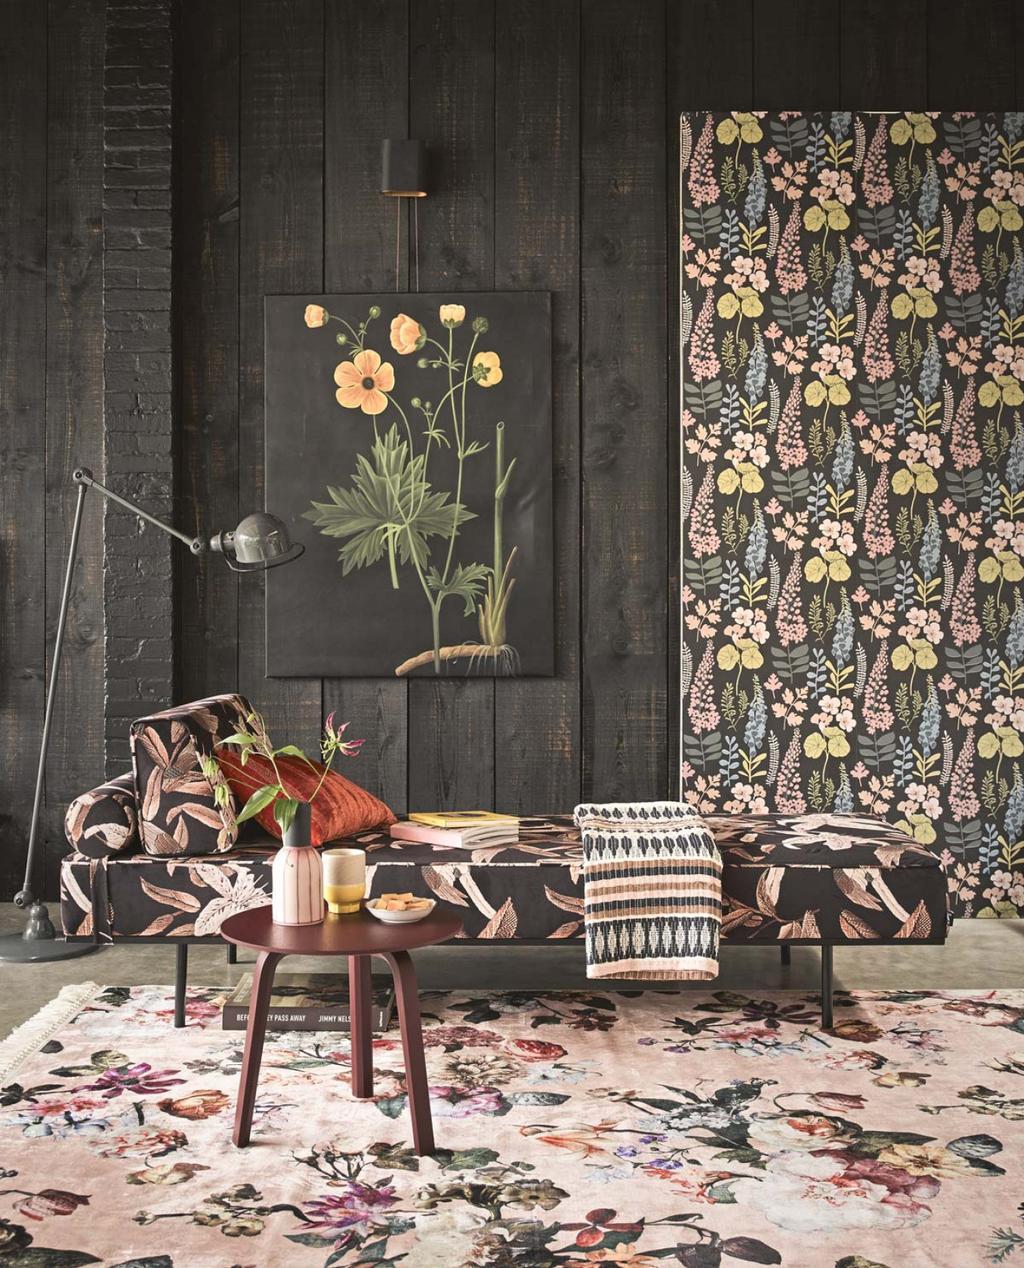 Chaise longue met bloemenbehang